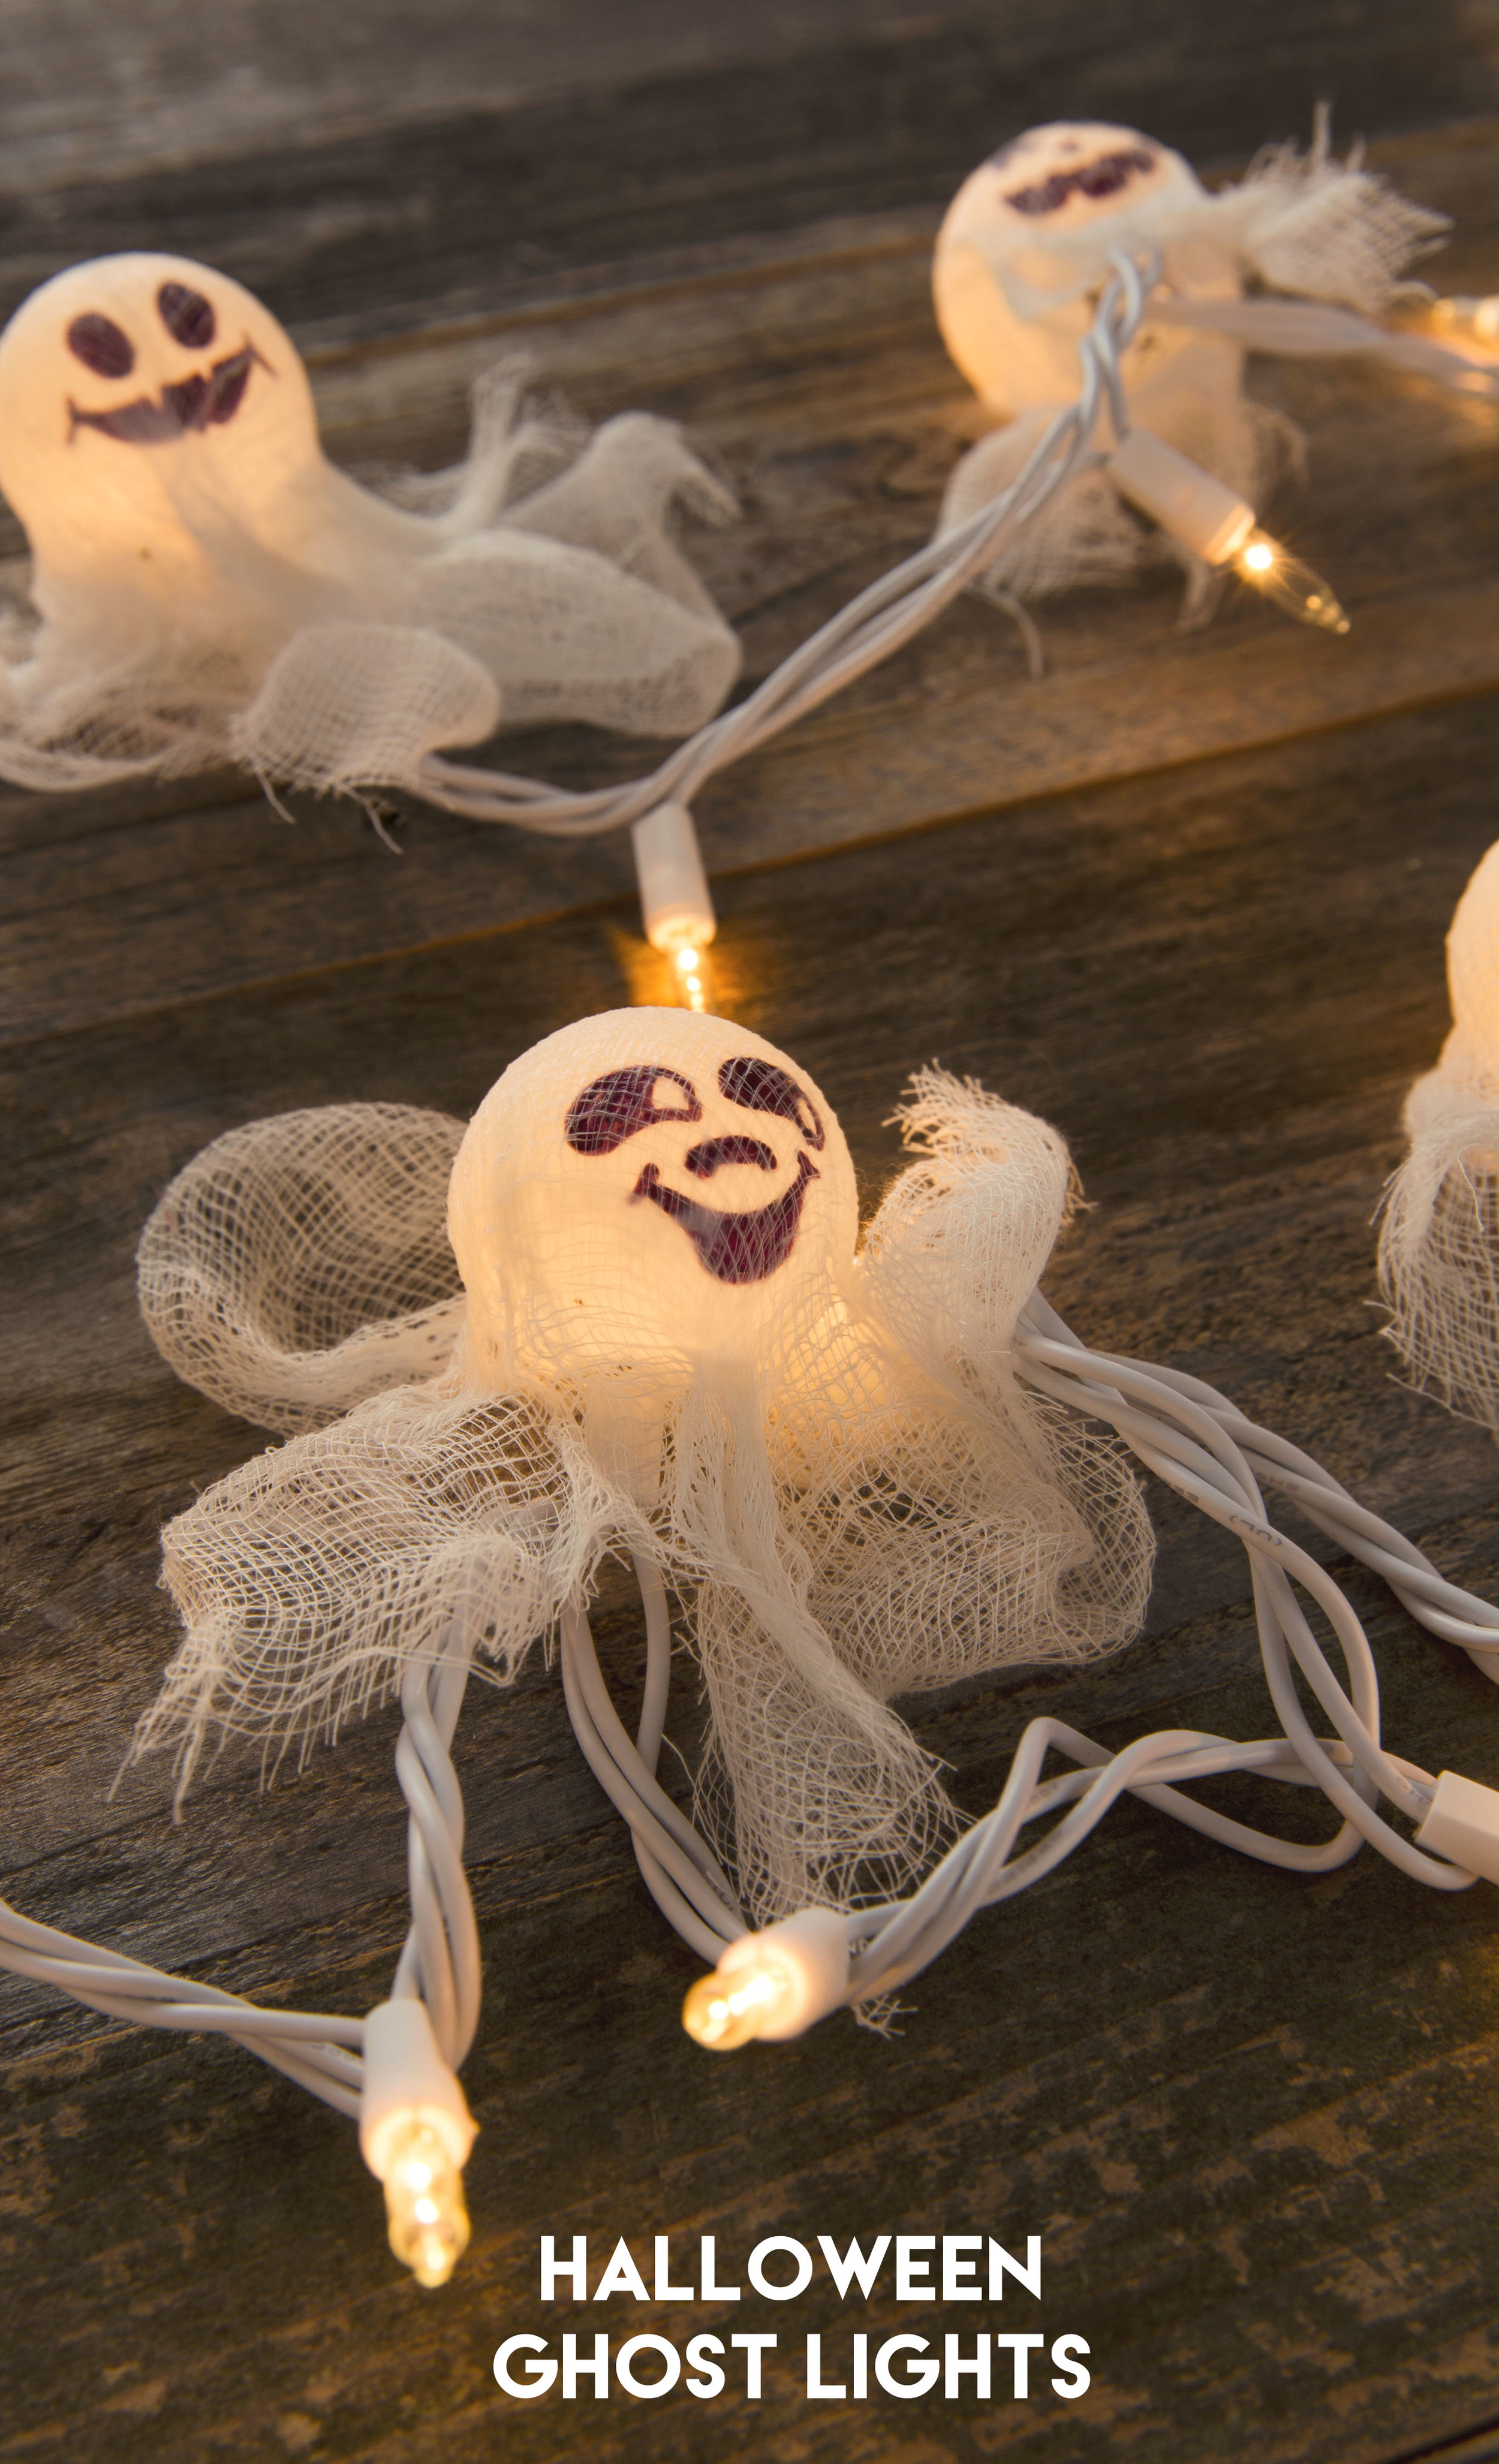 Cute Halloween Ghost Lights DIY